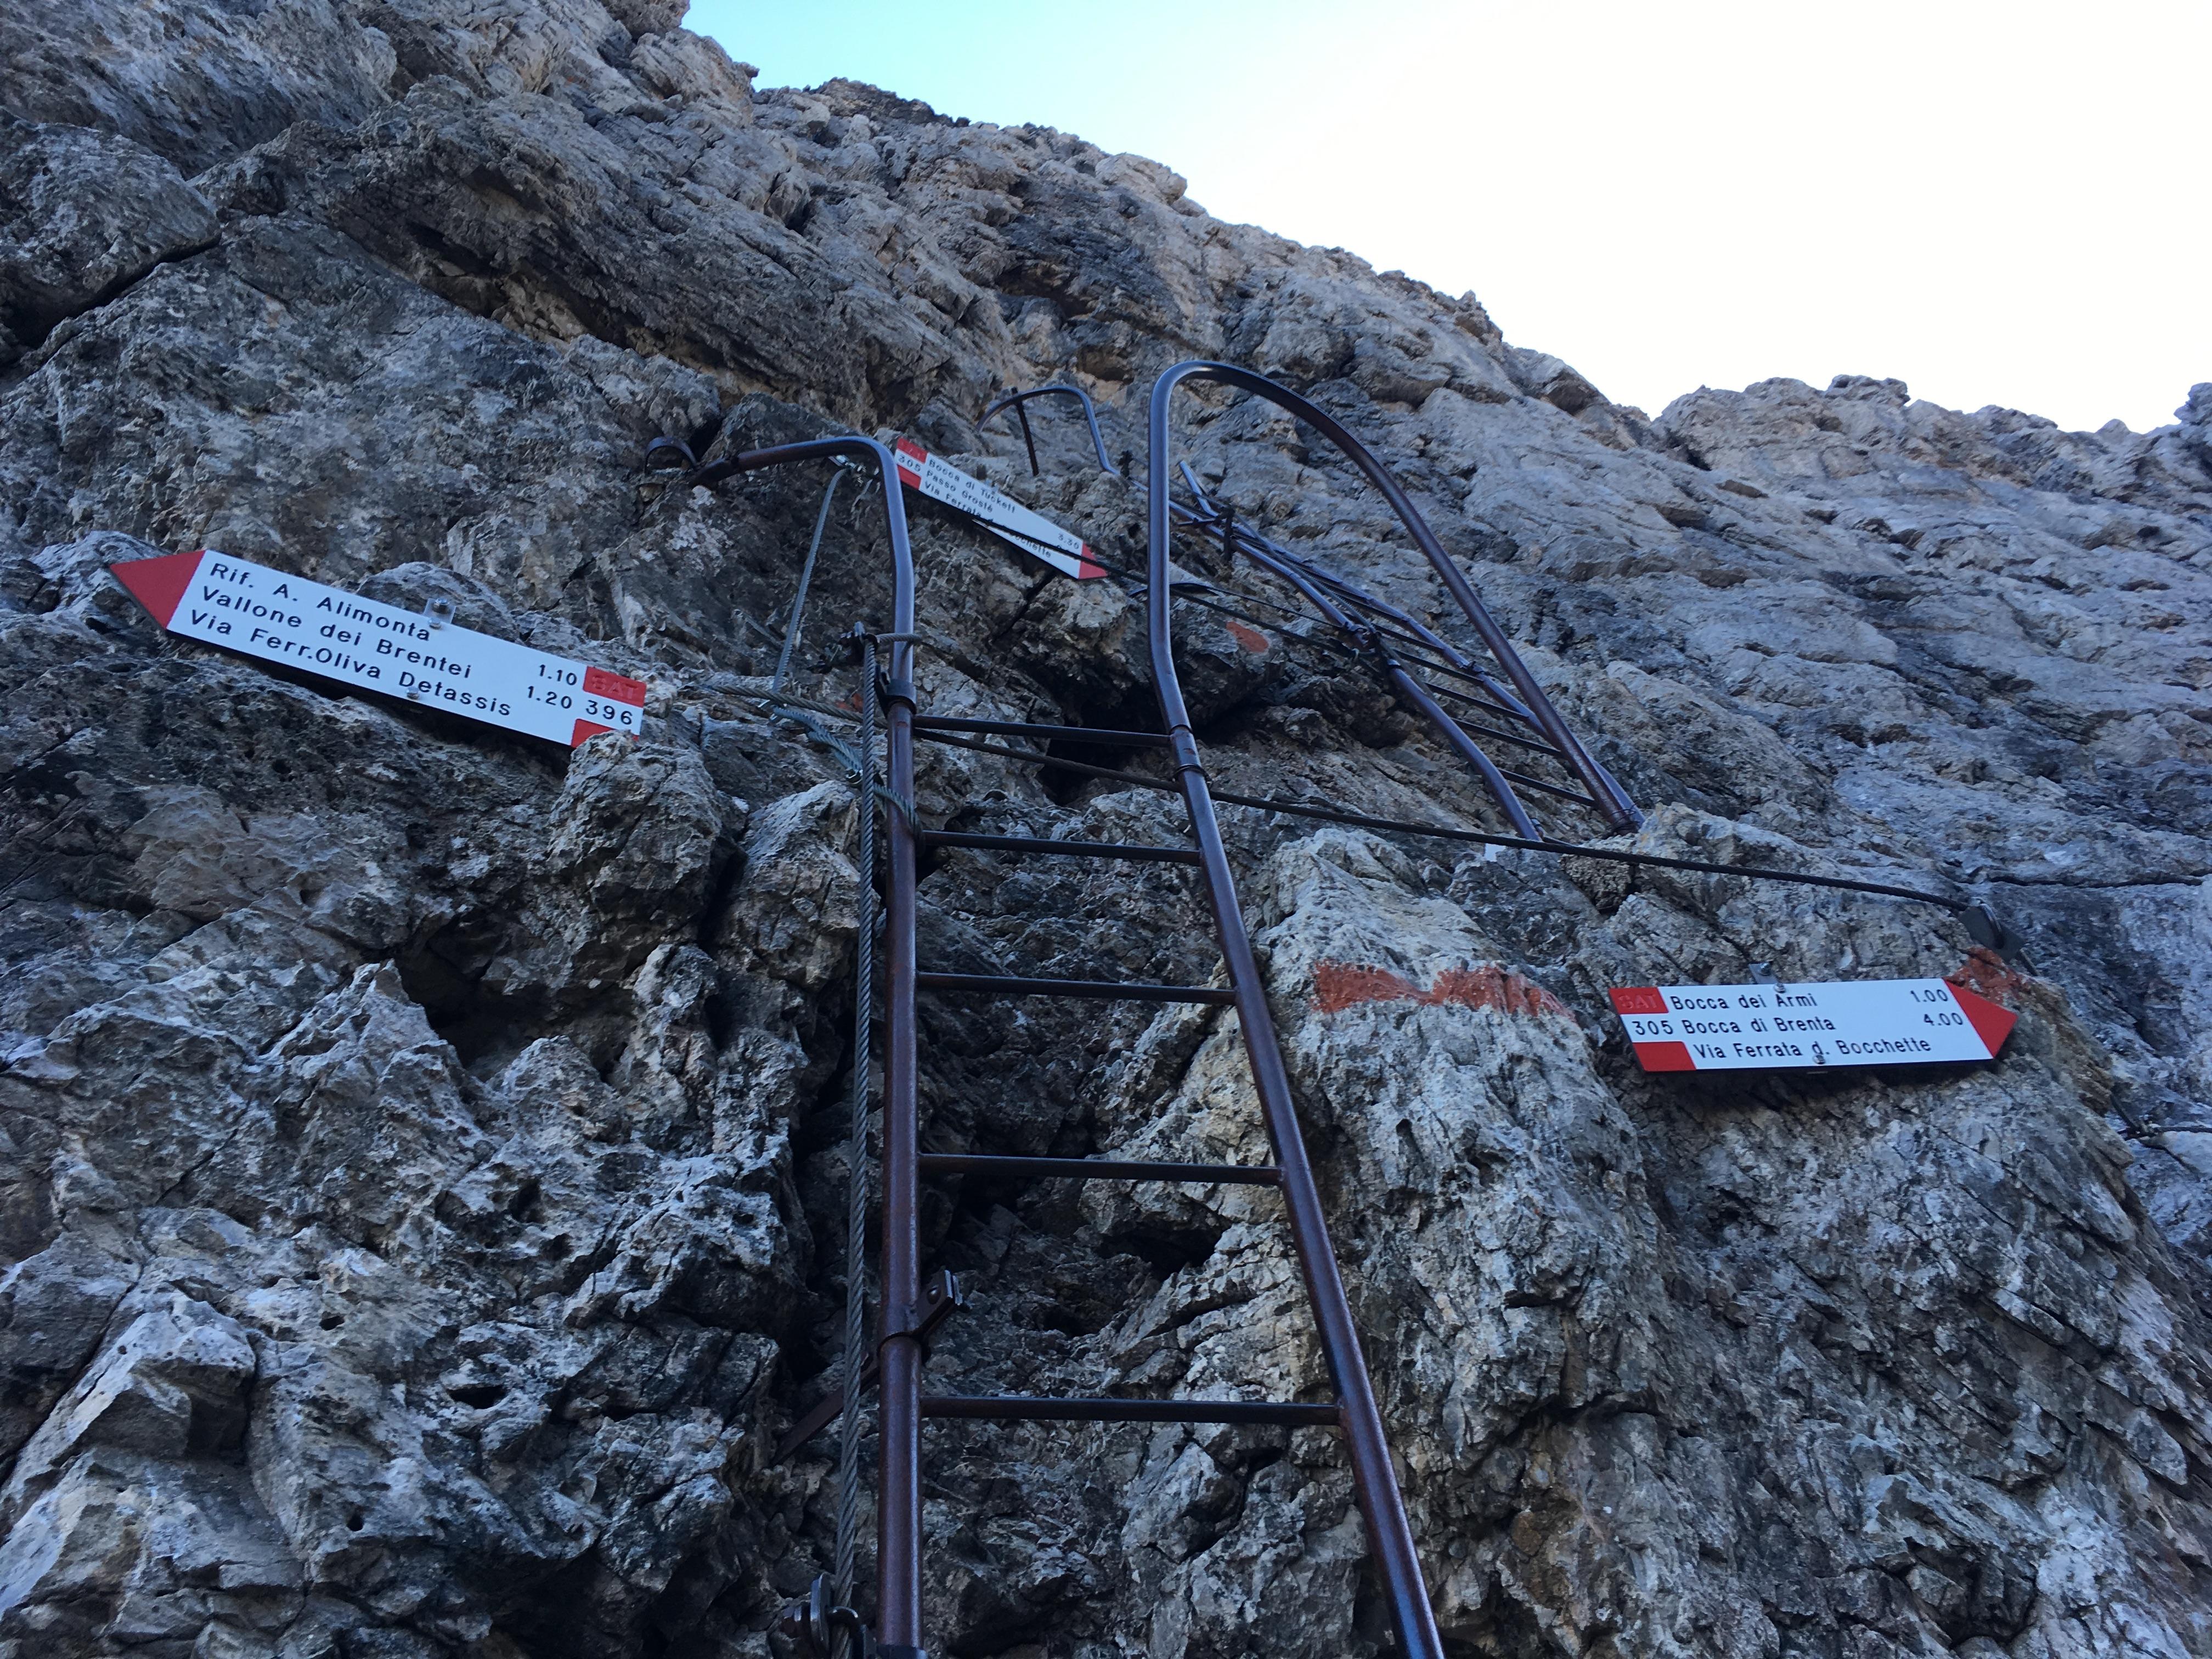 Ladder on a Via Ferrata in the Alps